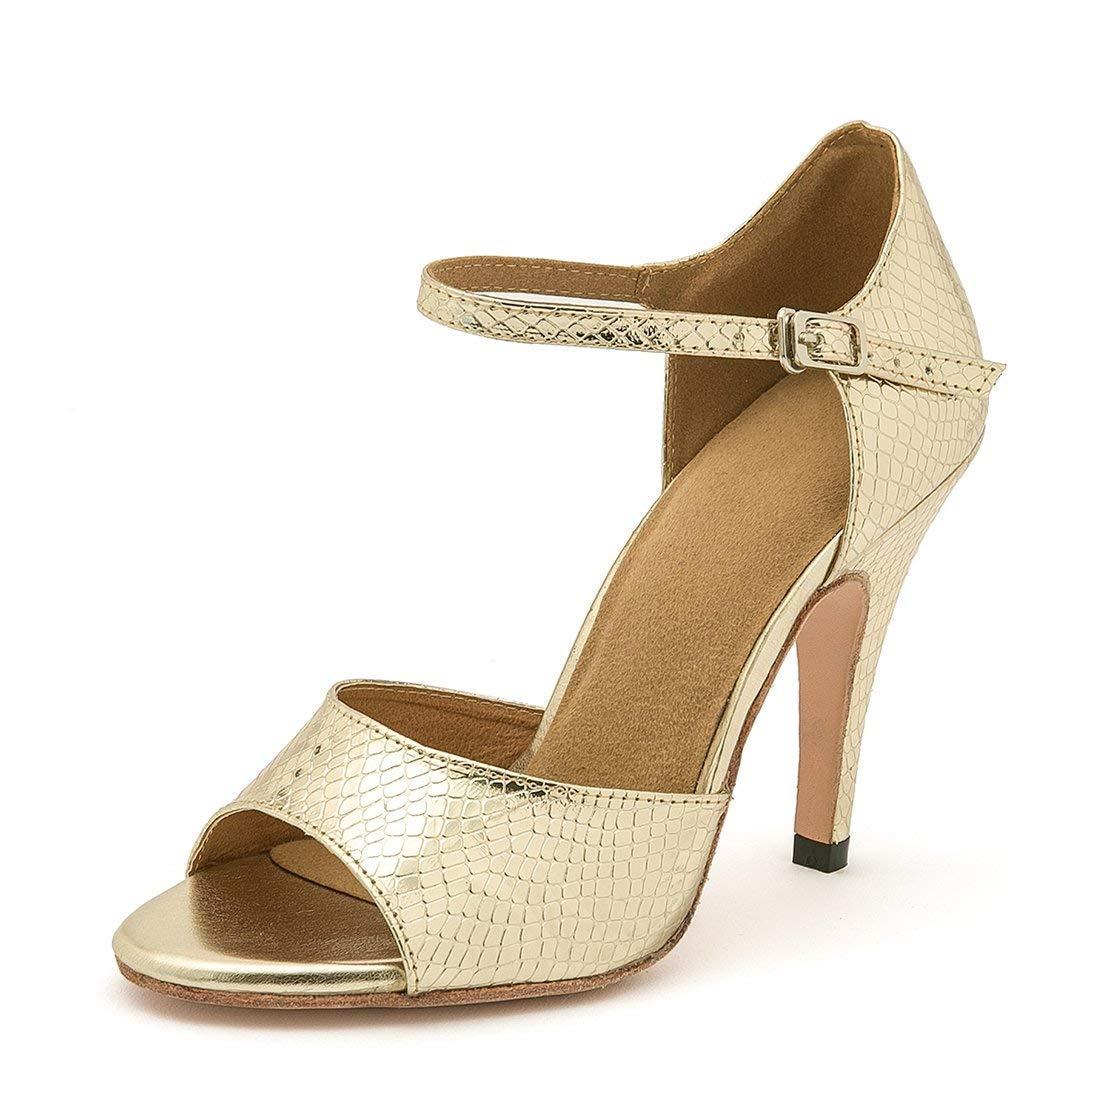 Qiusa Frauen Stiletto High Heel Heel Heel synthetische Tango Dance Sandalen (Farbe   Gold-4  Heel Größe   3.5 UK) bff628